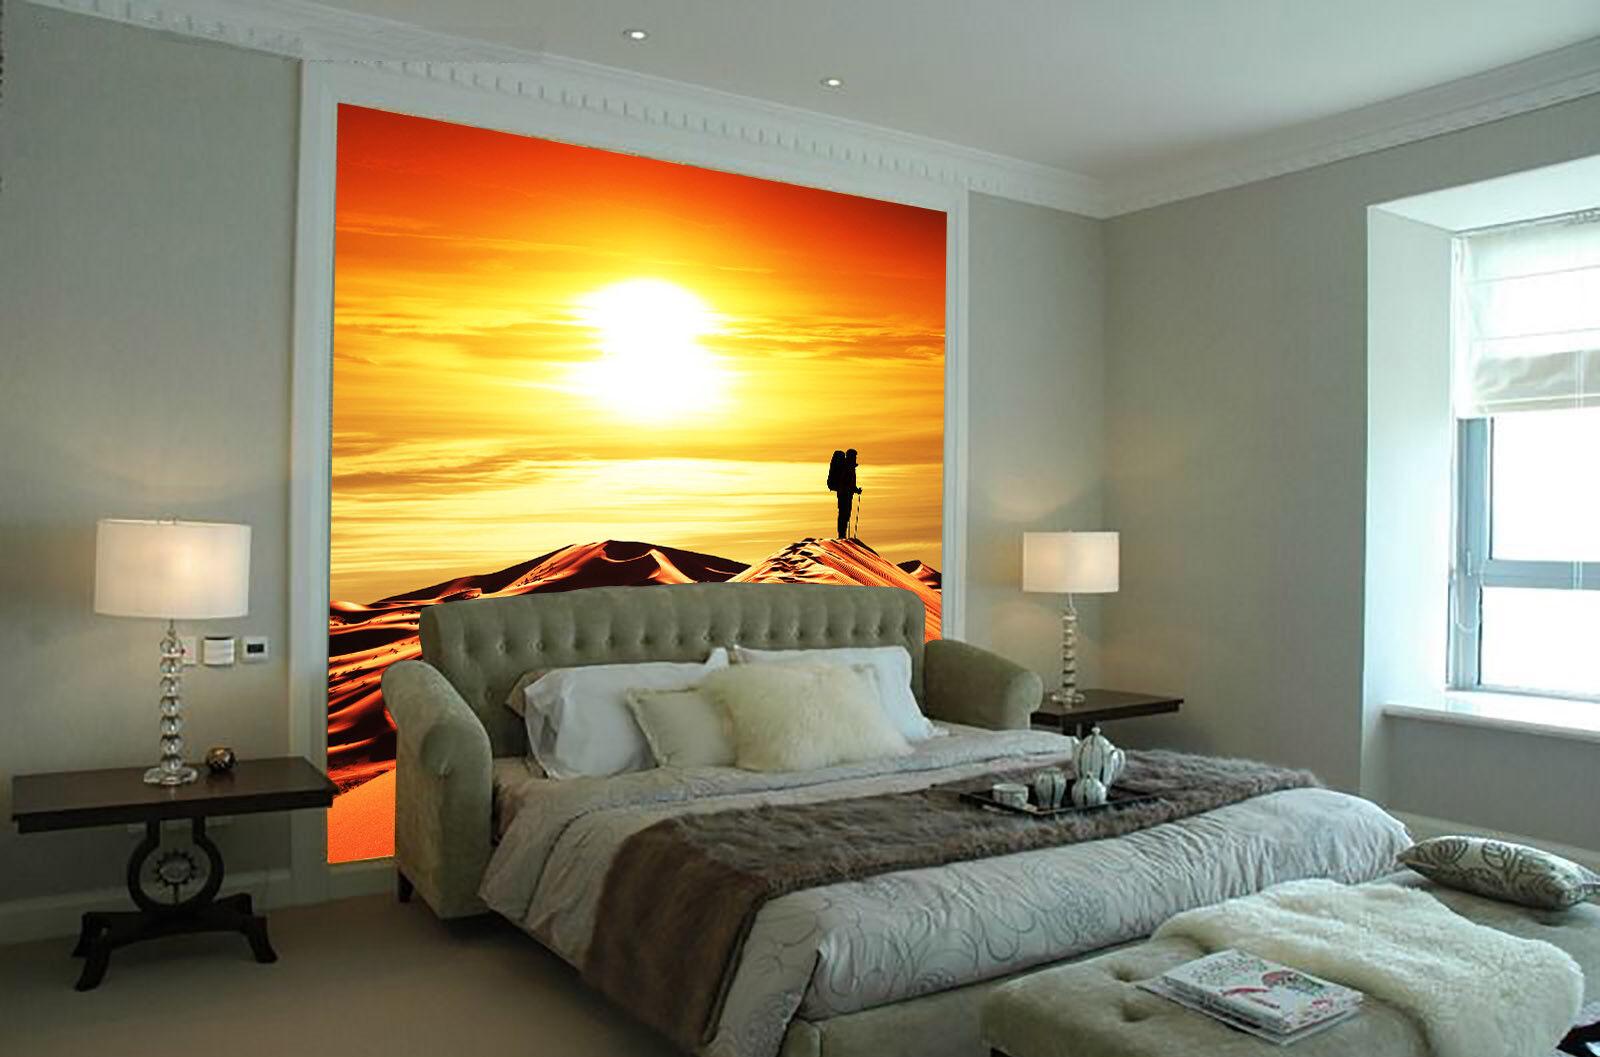 3D Wüste Sonnenaufgang 86 Tapete Wandgemälde Tapete Tapeten Bild Familie DE  | Flagship-Store  | Qualität Produkte  | Zart